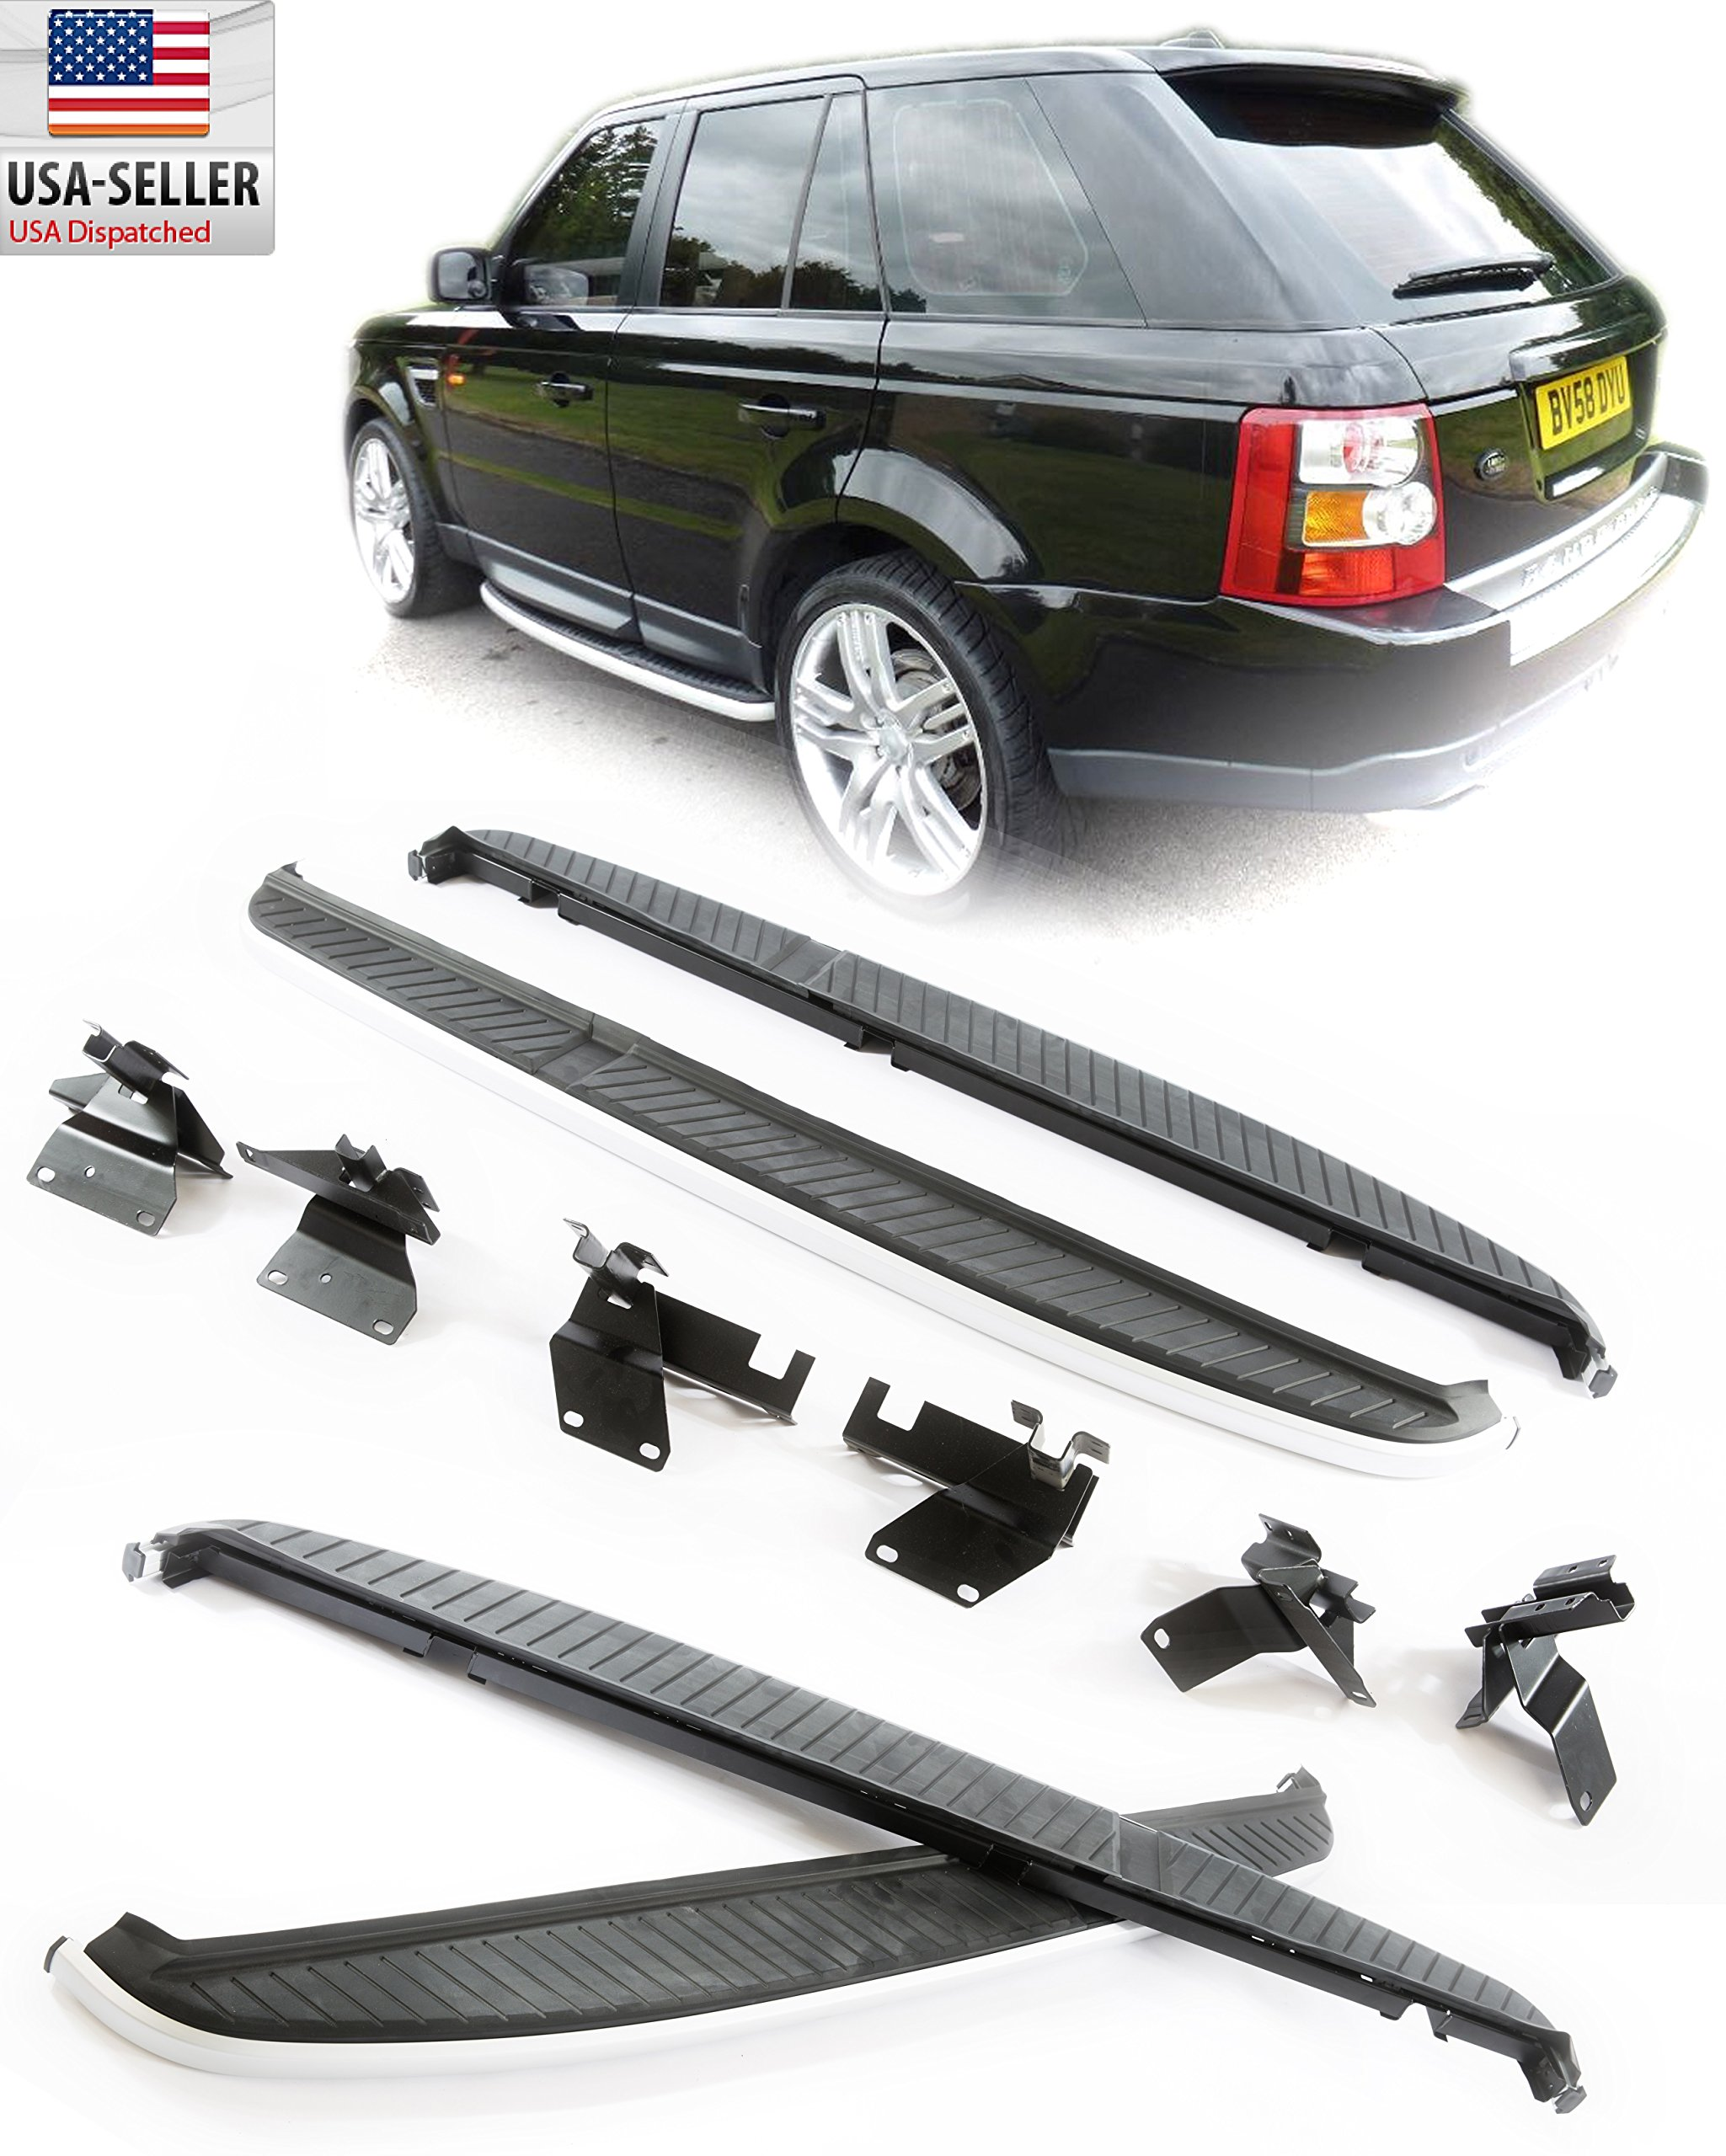 2006-2012 Land Rover Range Rover Sport Aluminum Running Board Side step Bar Bolt On (Supercharged Sport) ONLY 2006 2007 2008 2009 2010 2011 2012